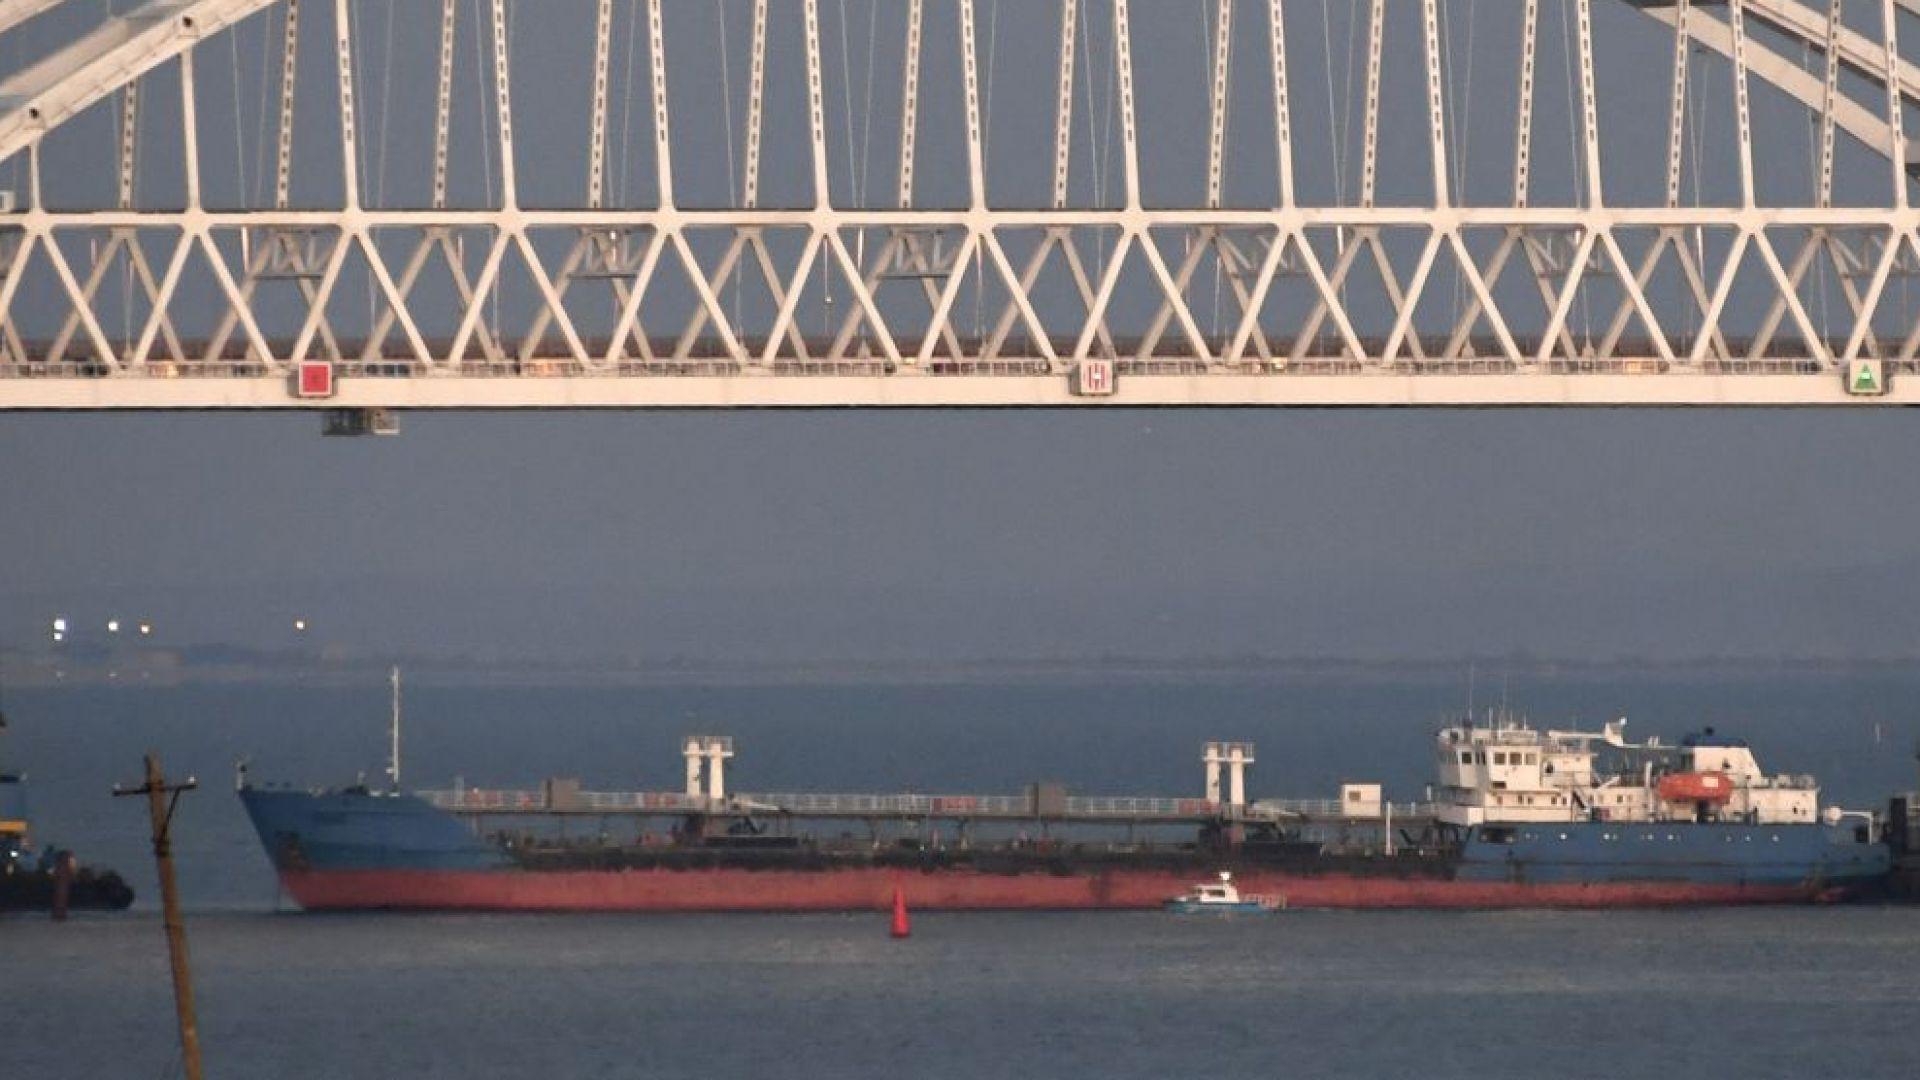 Украйна освободи екипажа на задържания руски танкер